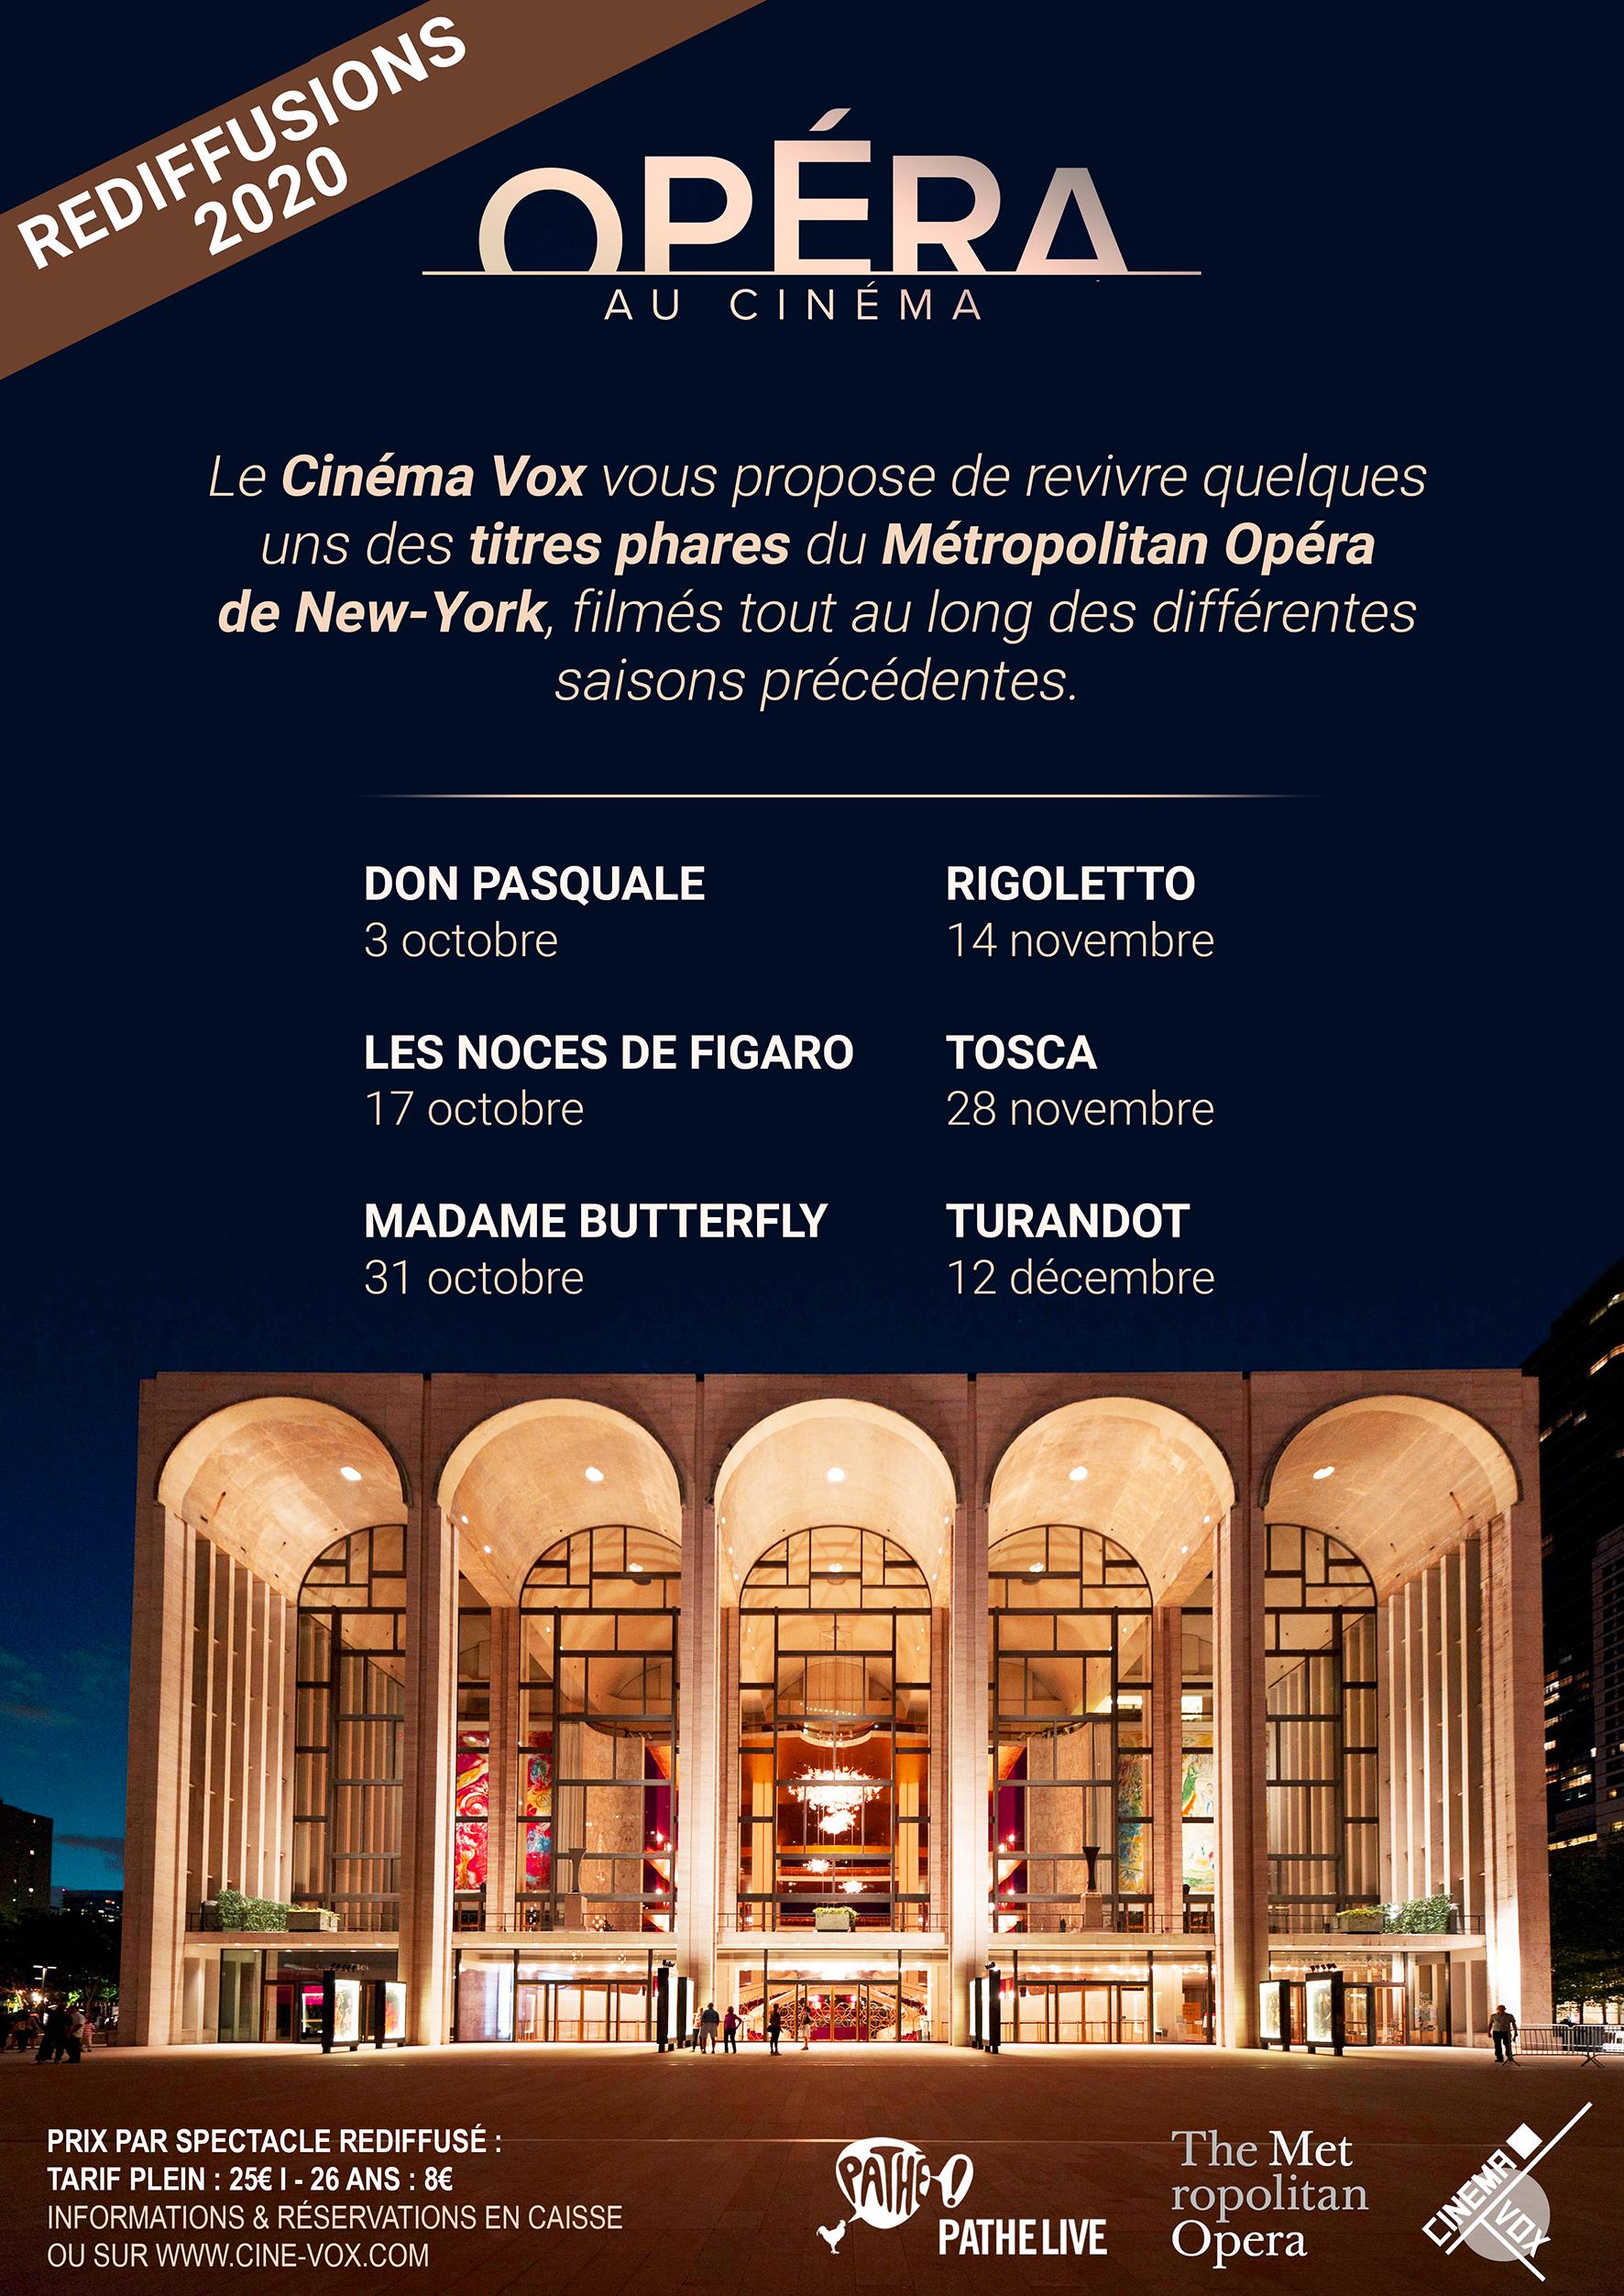 Rediffusions Opéra - Cinéma Vox